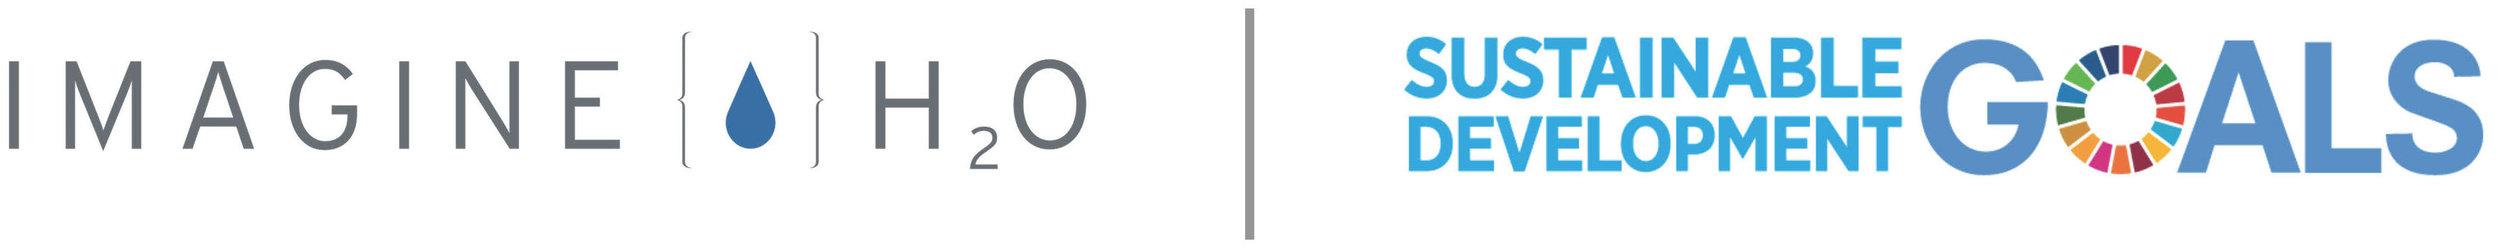 IH2O_SDG_logo_2.jpg